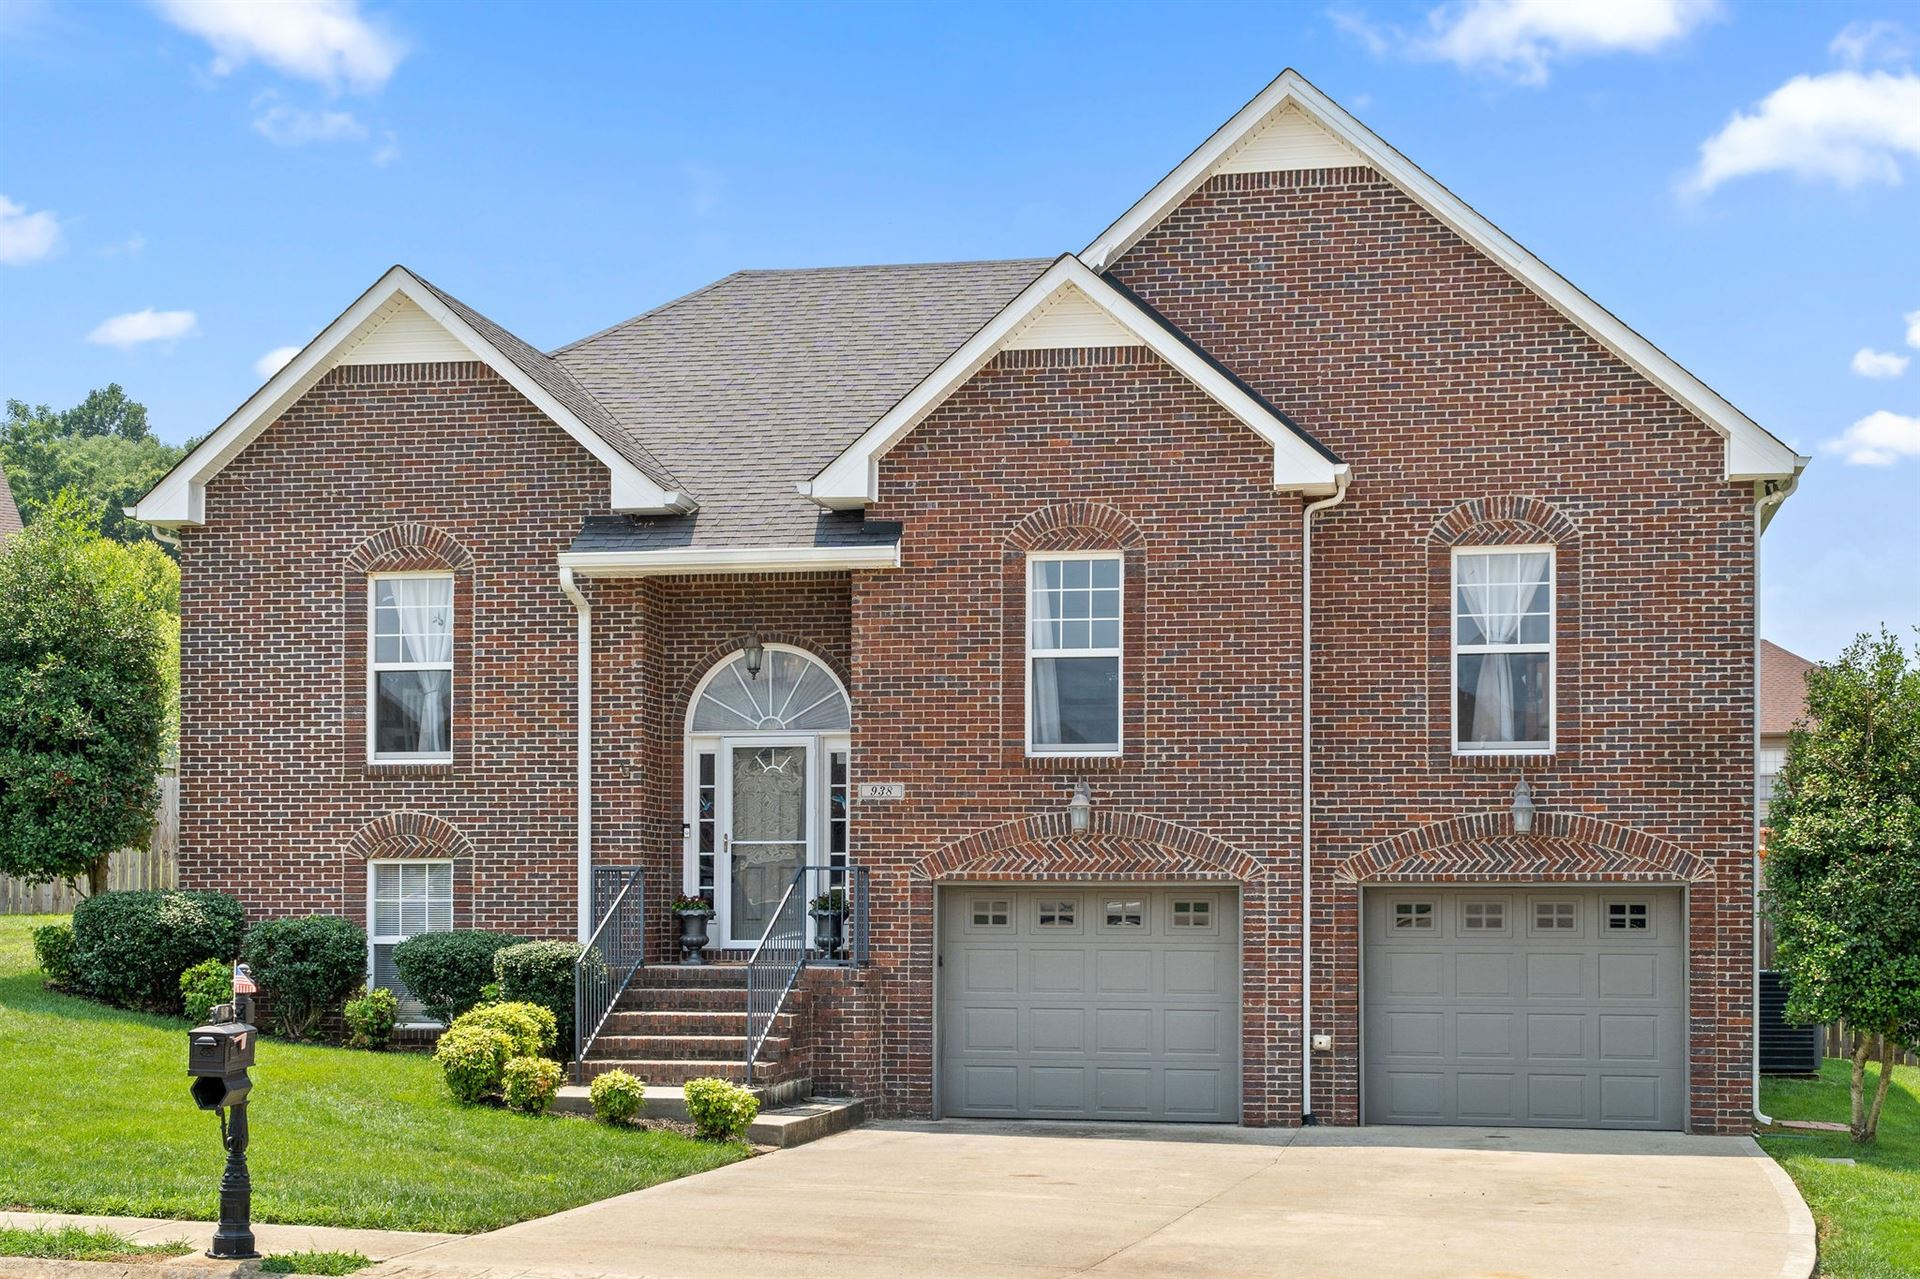 938 Spring Terrace Ct, Clarksville, TN 37040 - MLS#: 2274909